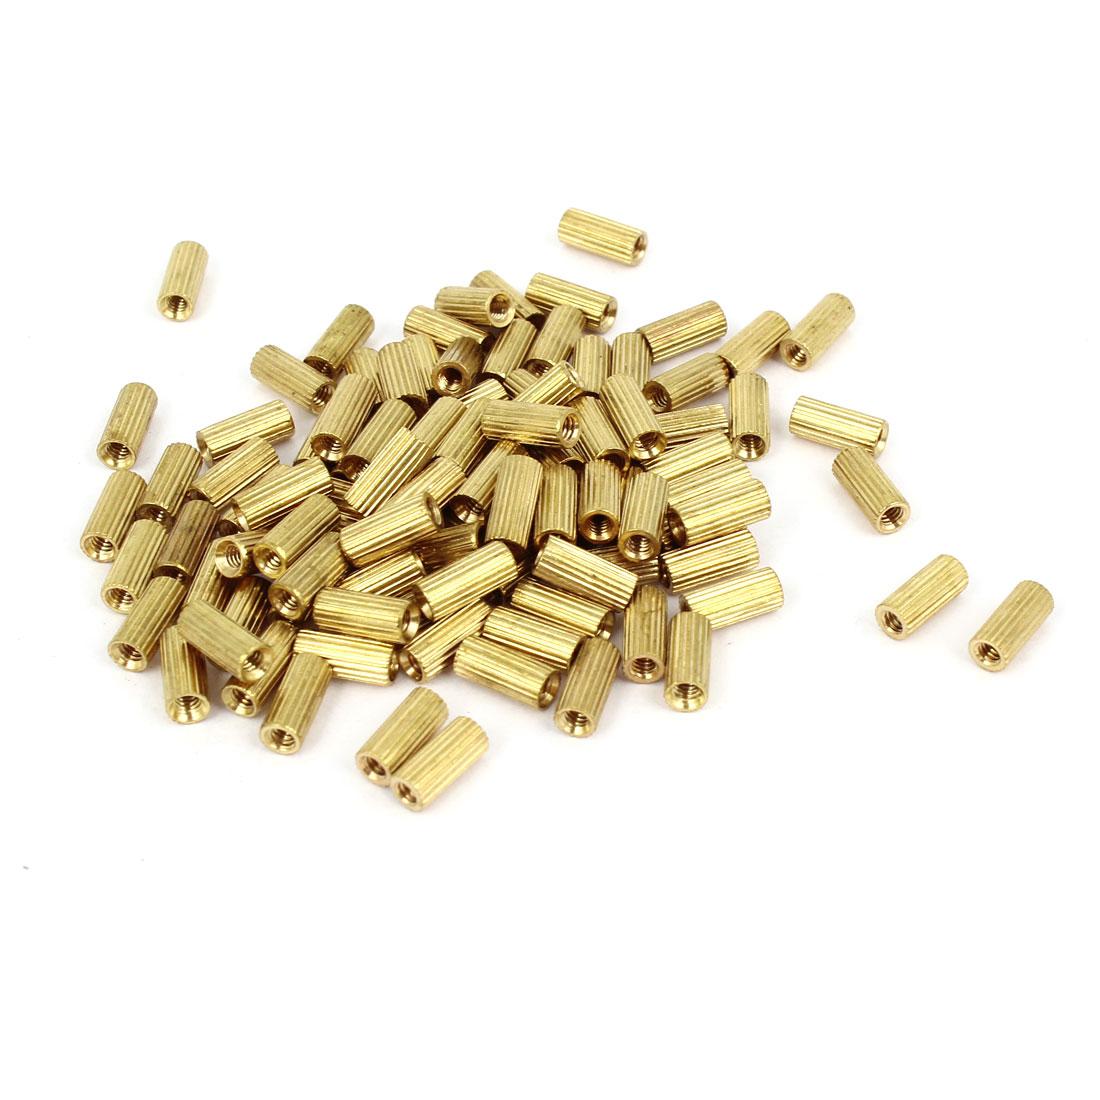 100 Pcs Female Threaded Pillars Brass Standoff Spacer Gold Tone M2x7mm